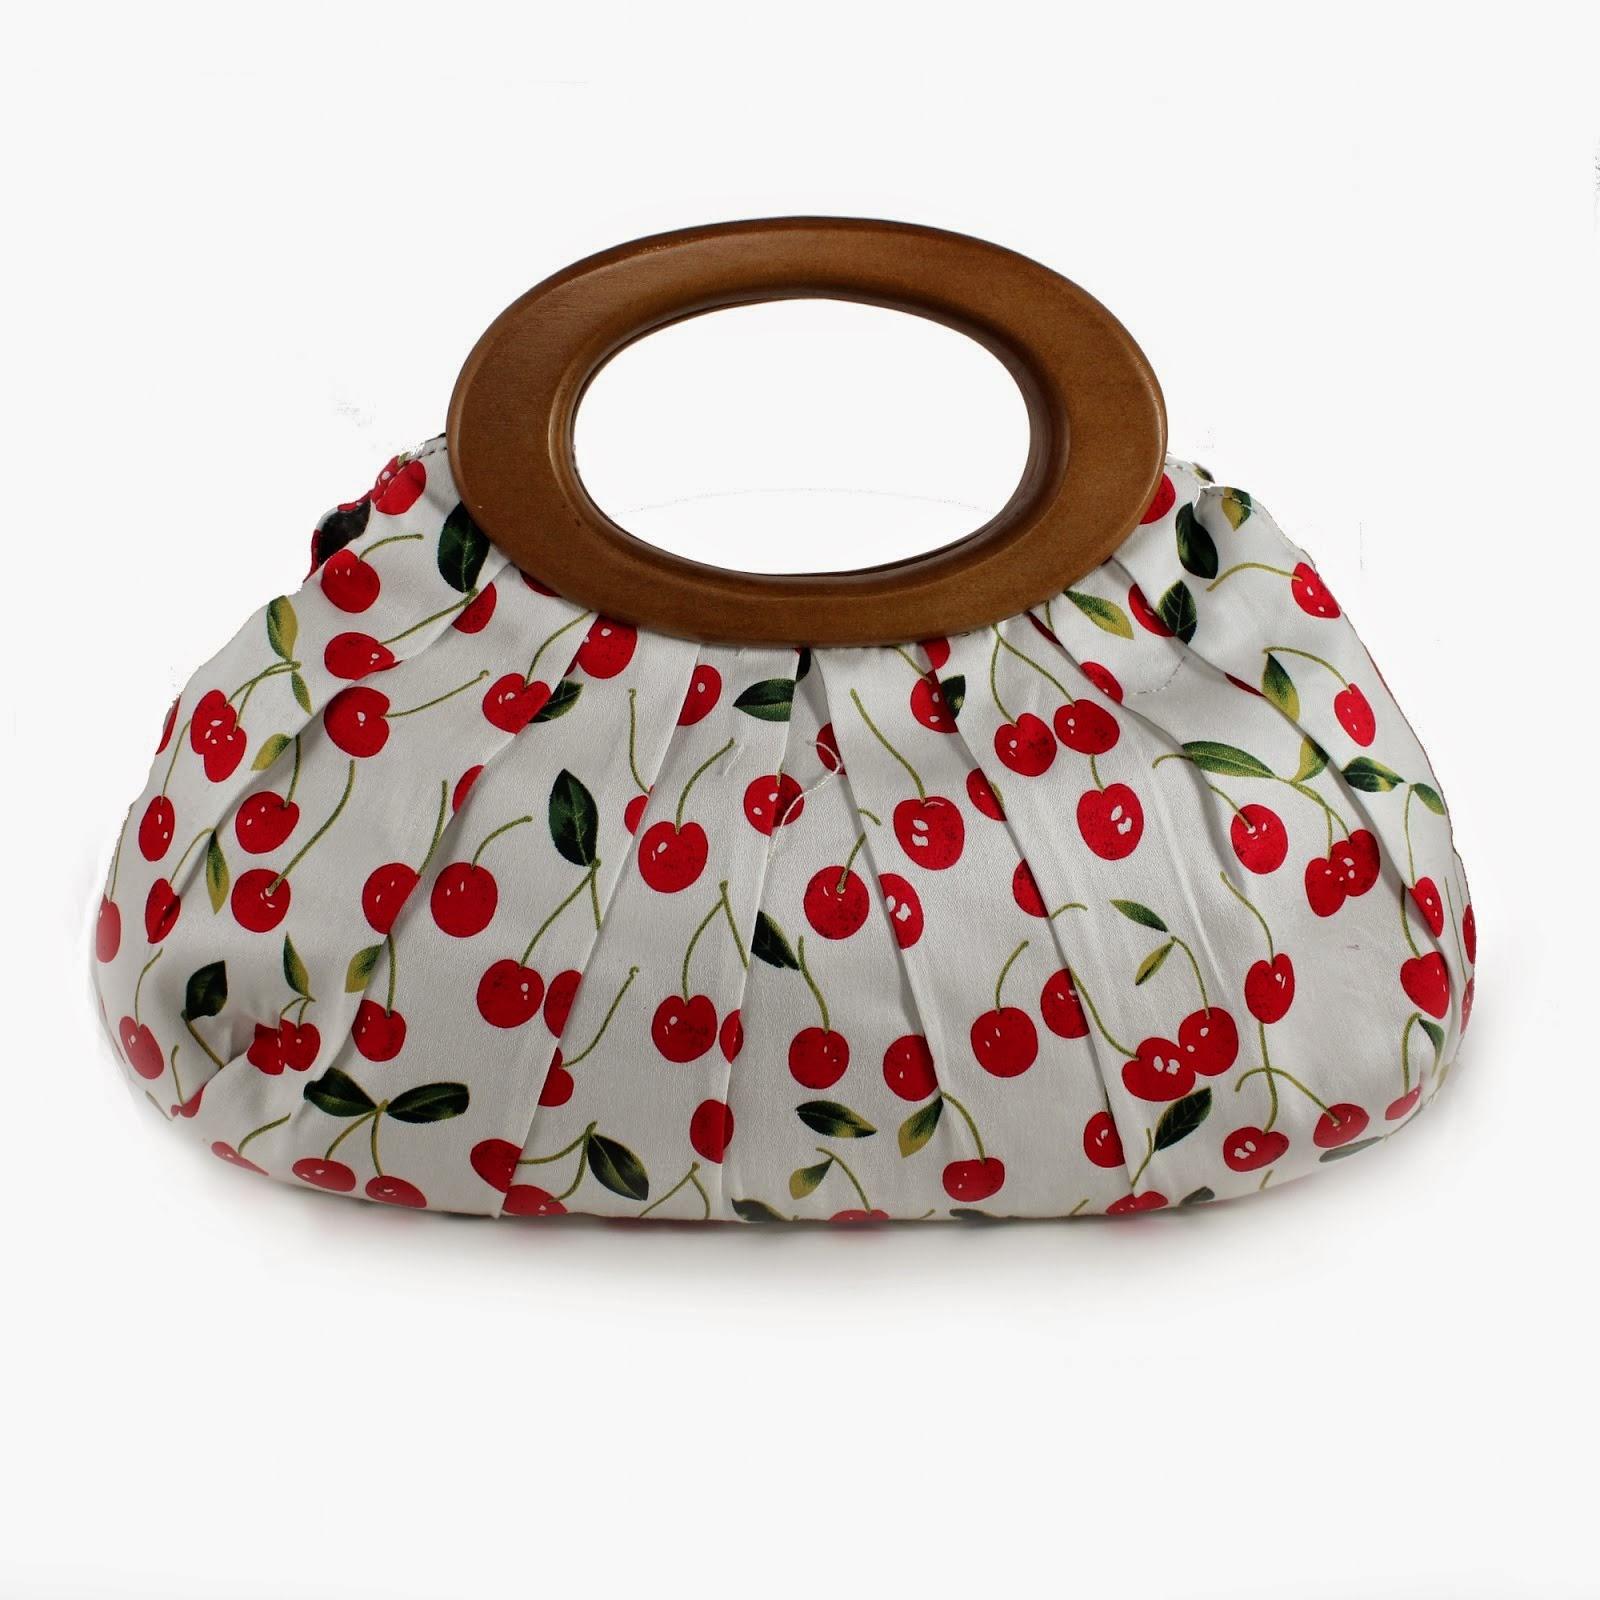 Cherry Bags